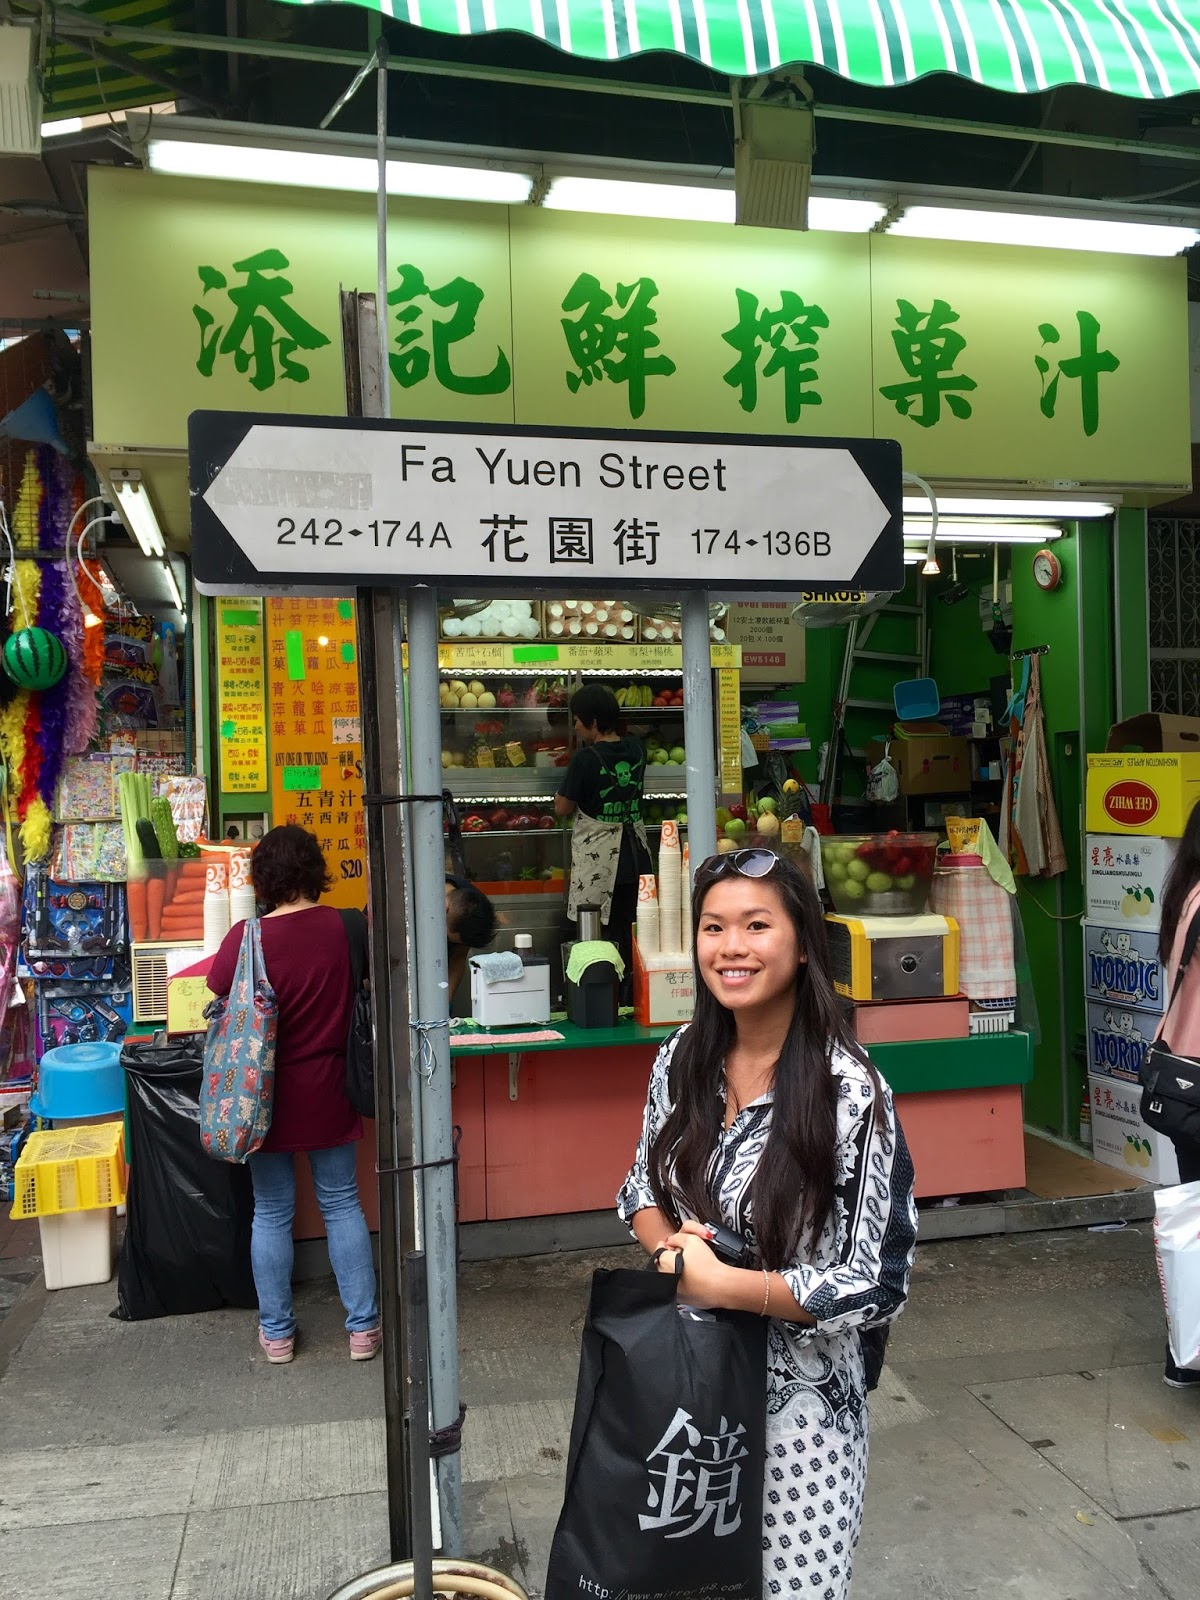 Hong Kong travel diary blog vlog mong kok fa yuen street